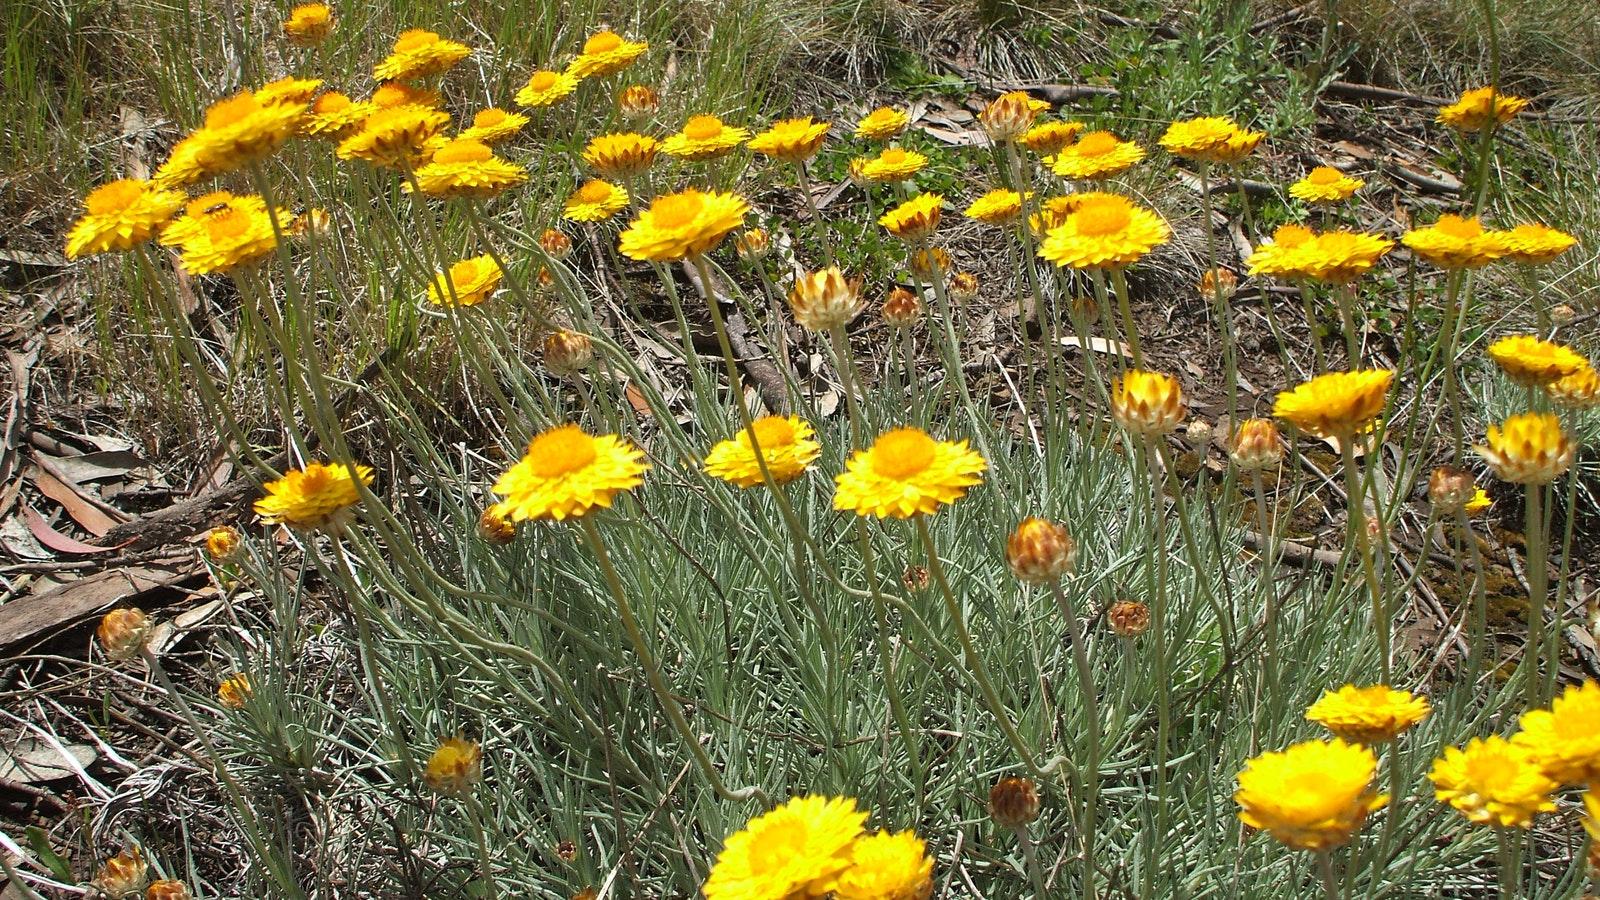 Spring wildflowers, golden everlasting daisy